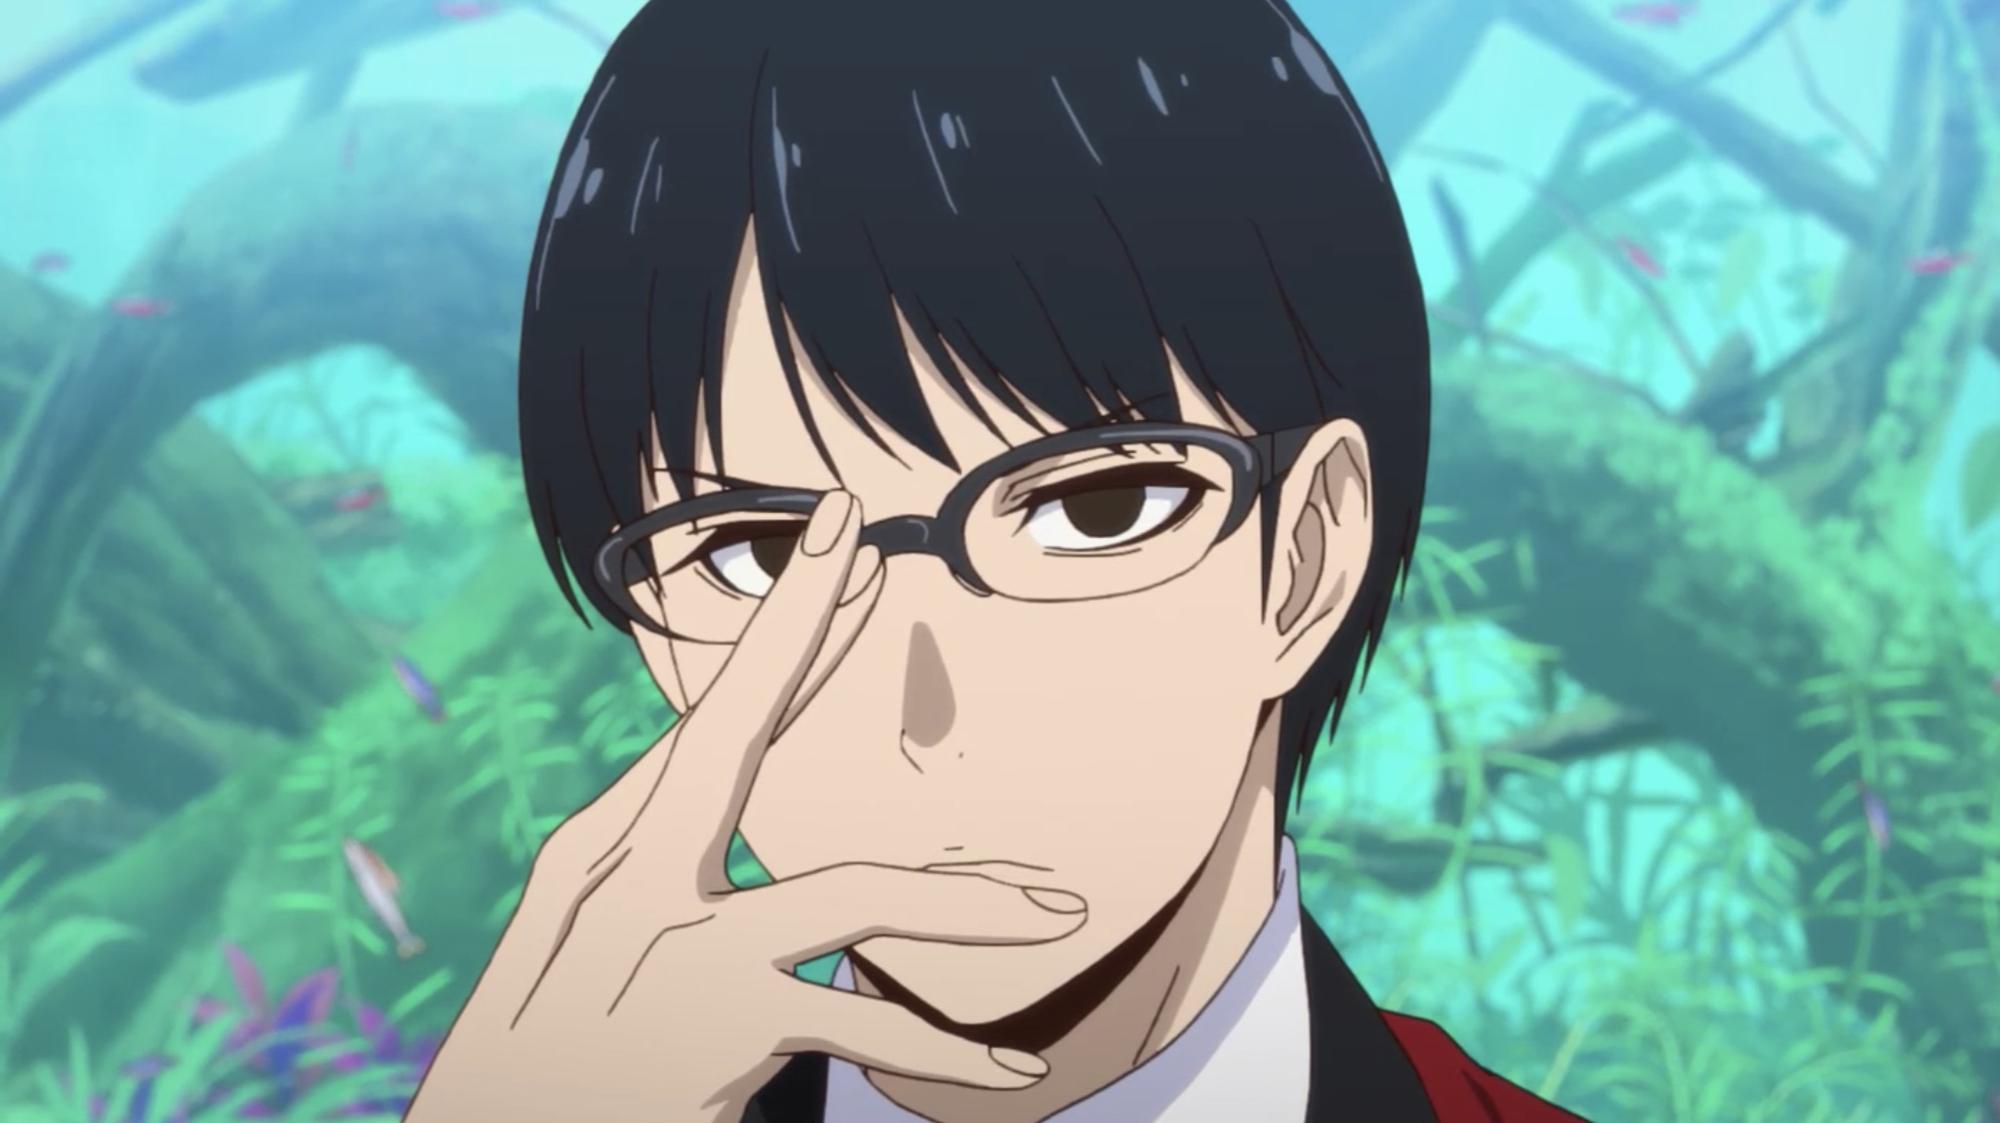 Kakegurui Manyuda Kaede Kakegurui anime ManyudaKaede